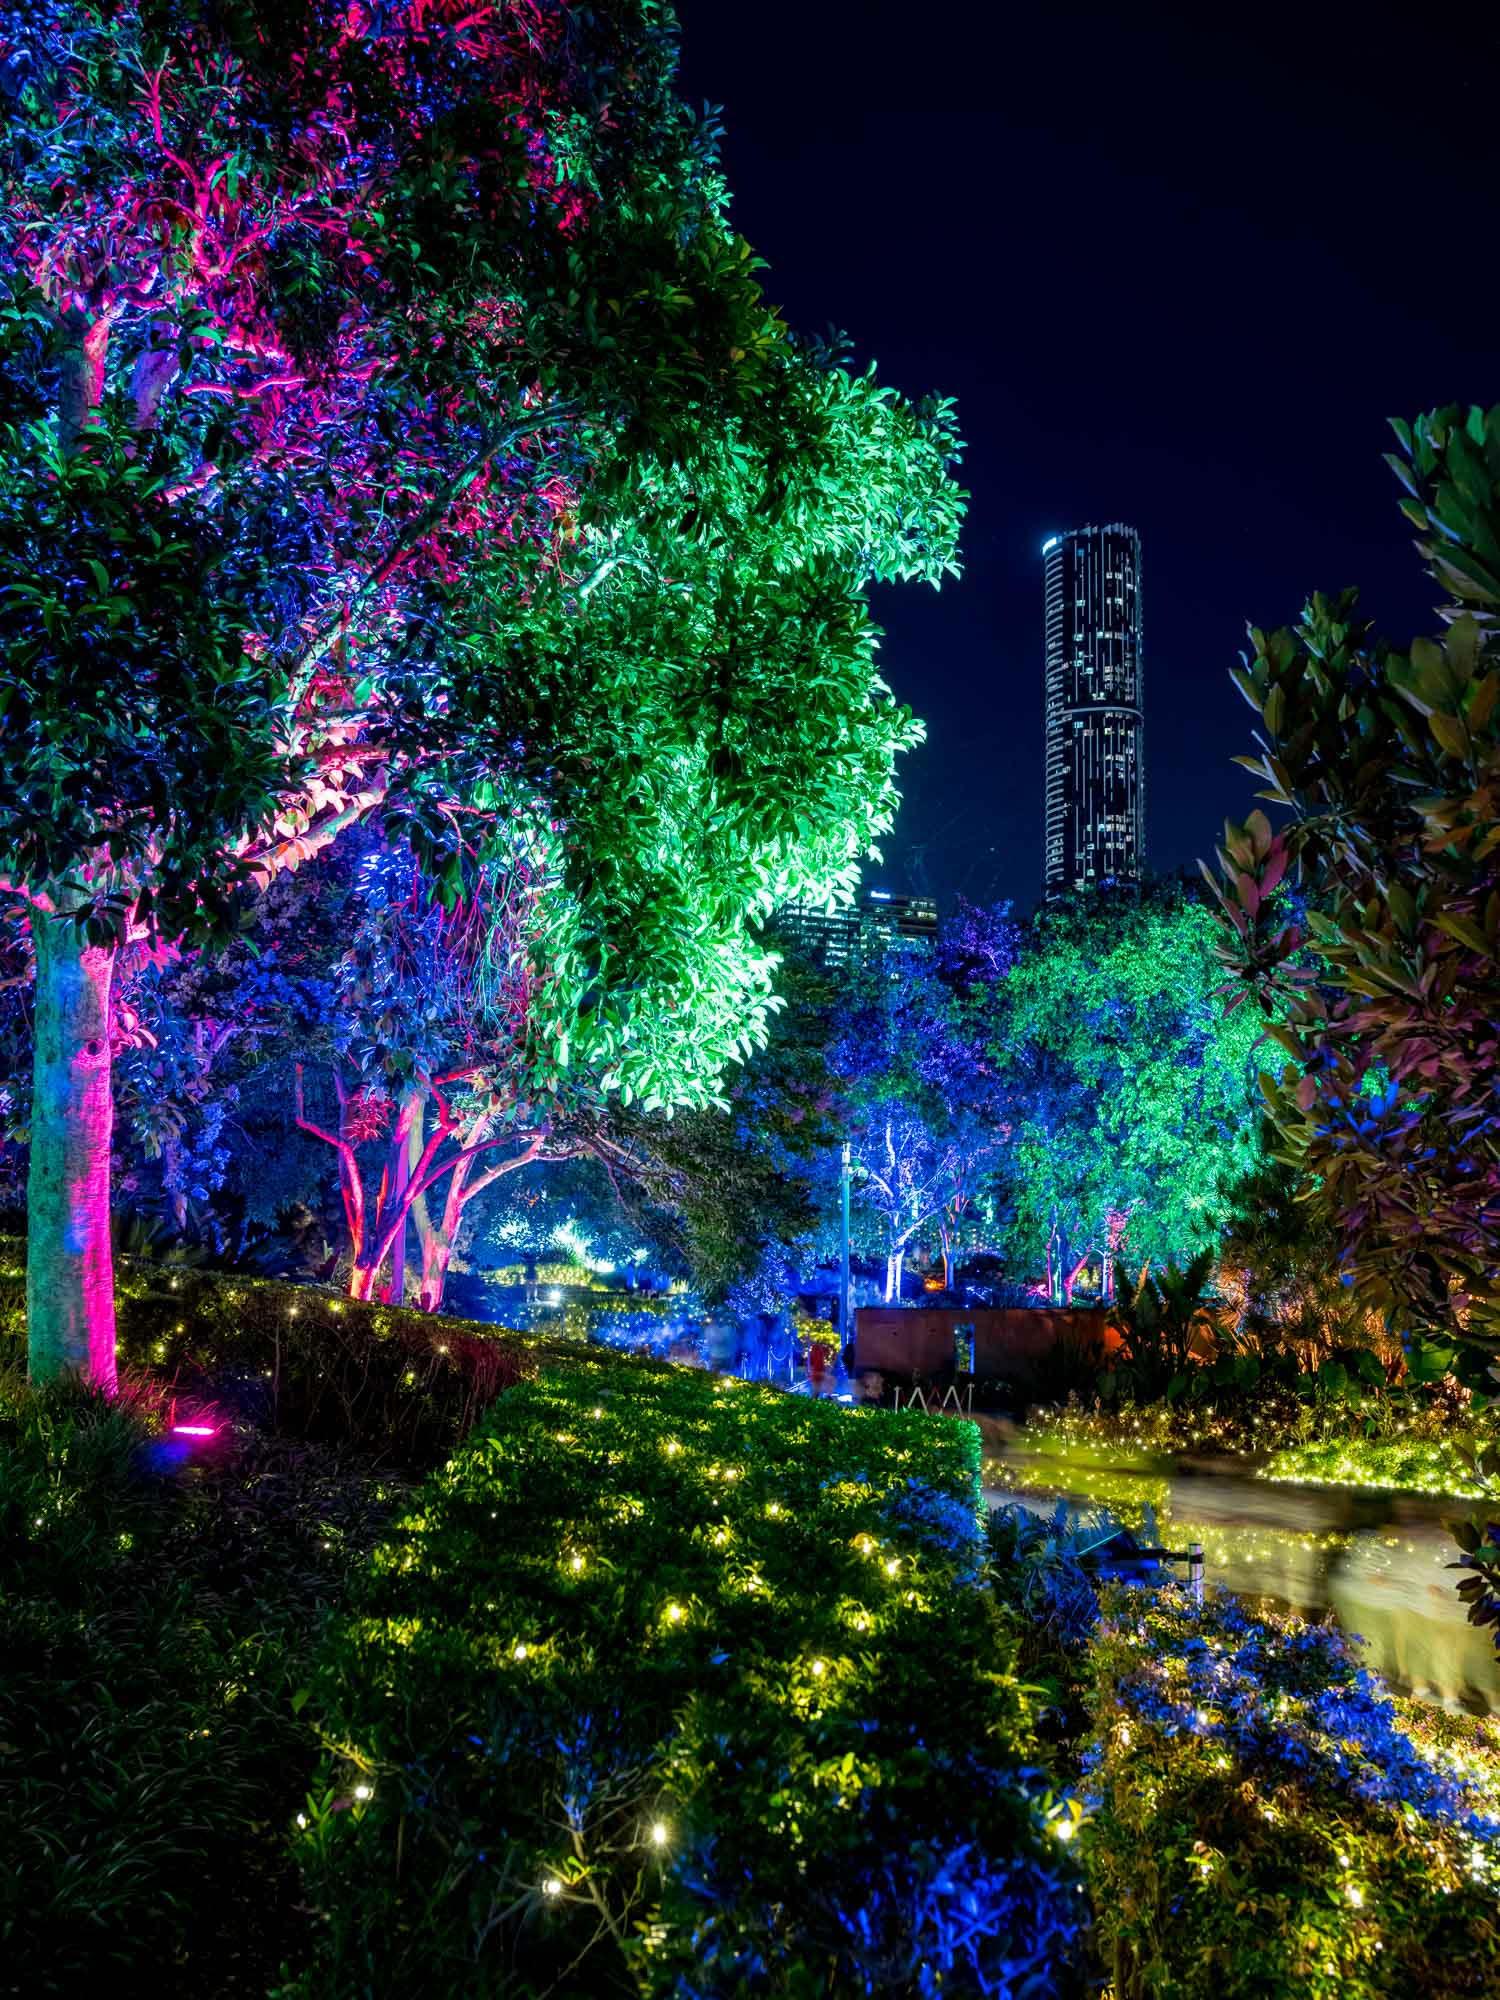 ROMAST_Garden2.jpg